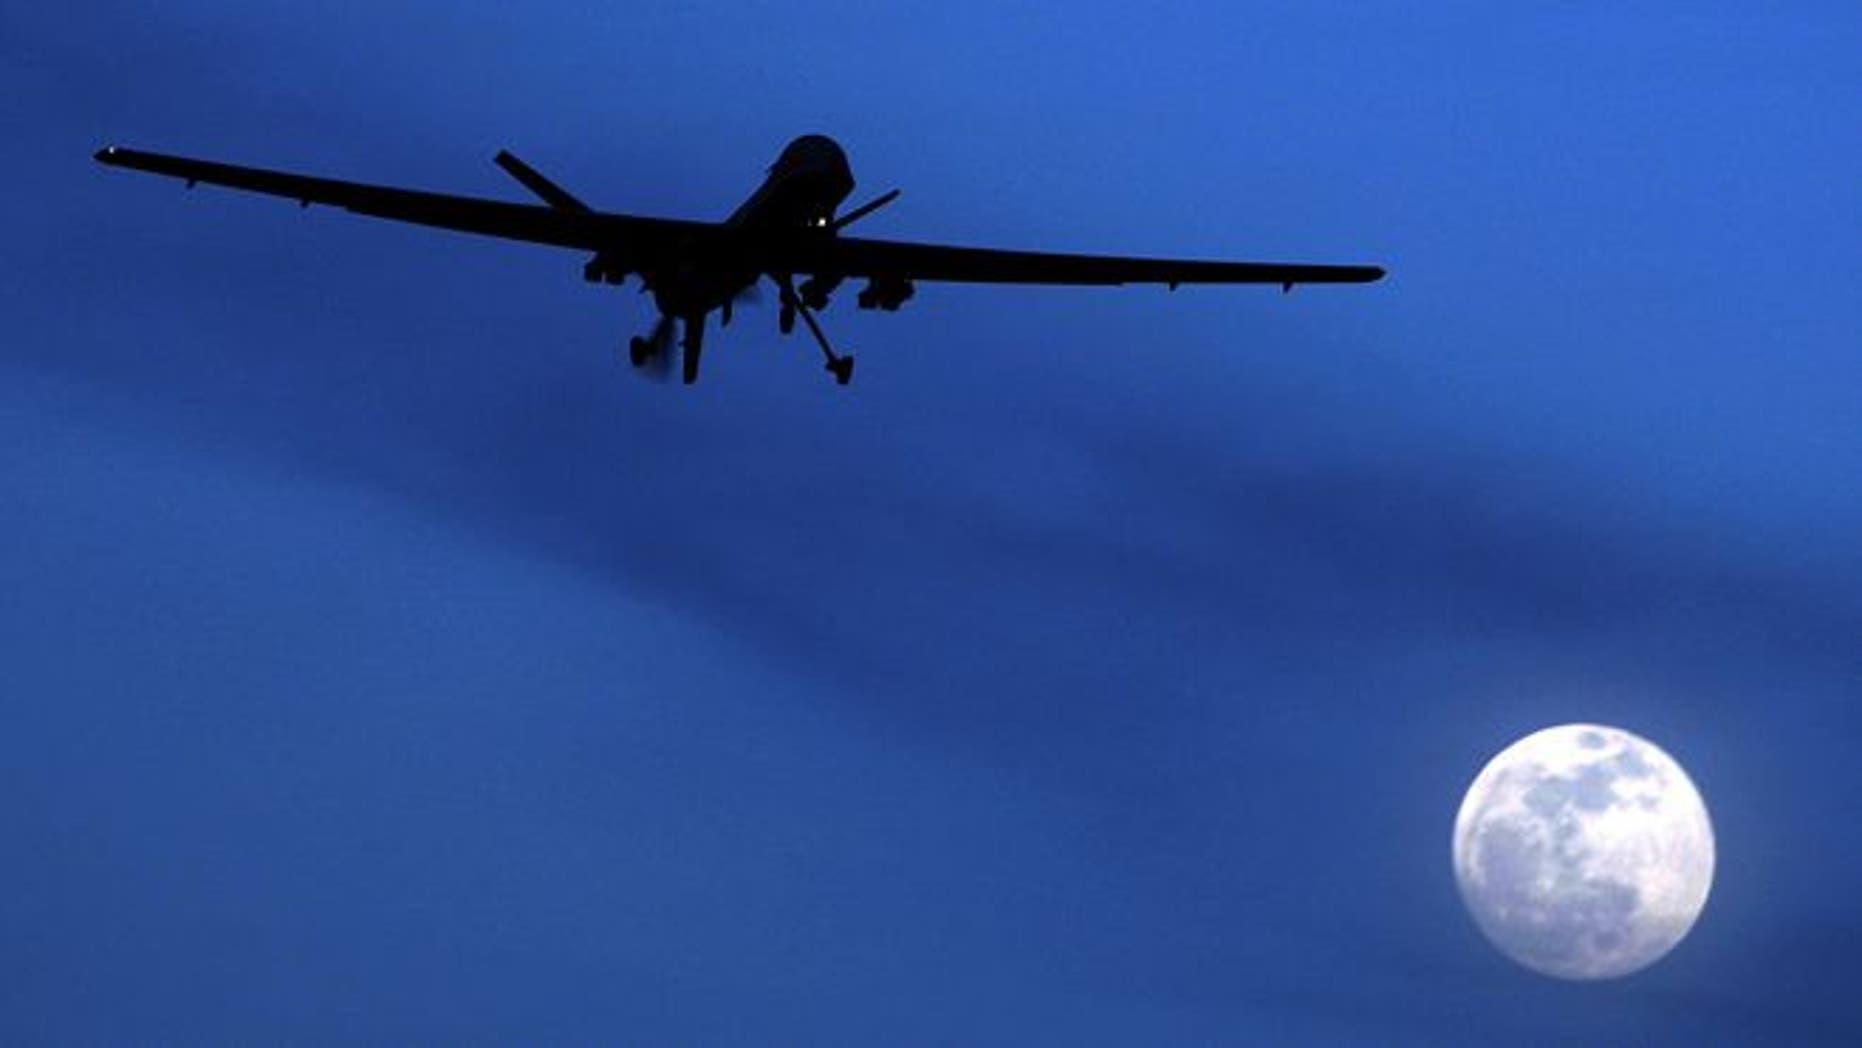 Jan. 31, 2010: An unmanned U.S. Predator drone flies over Kandahar Air Field, southern Afghanistan.